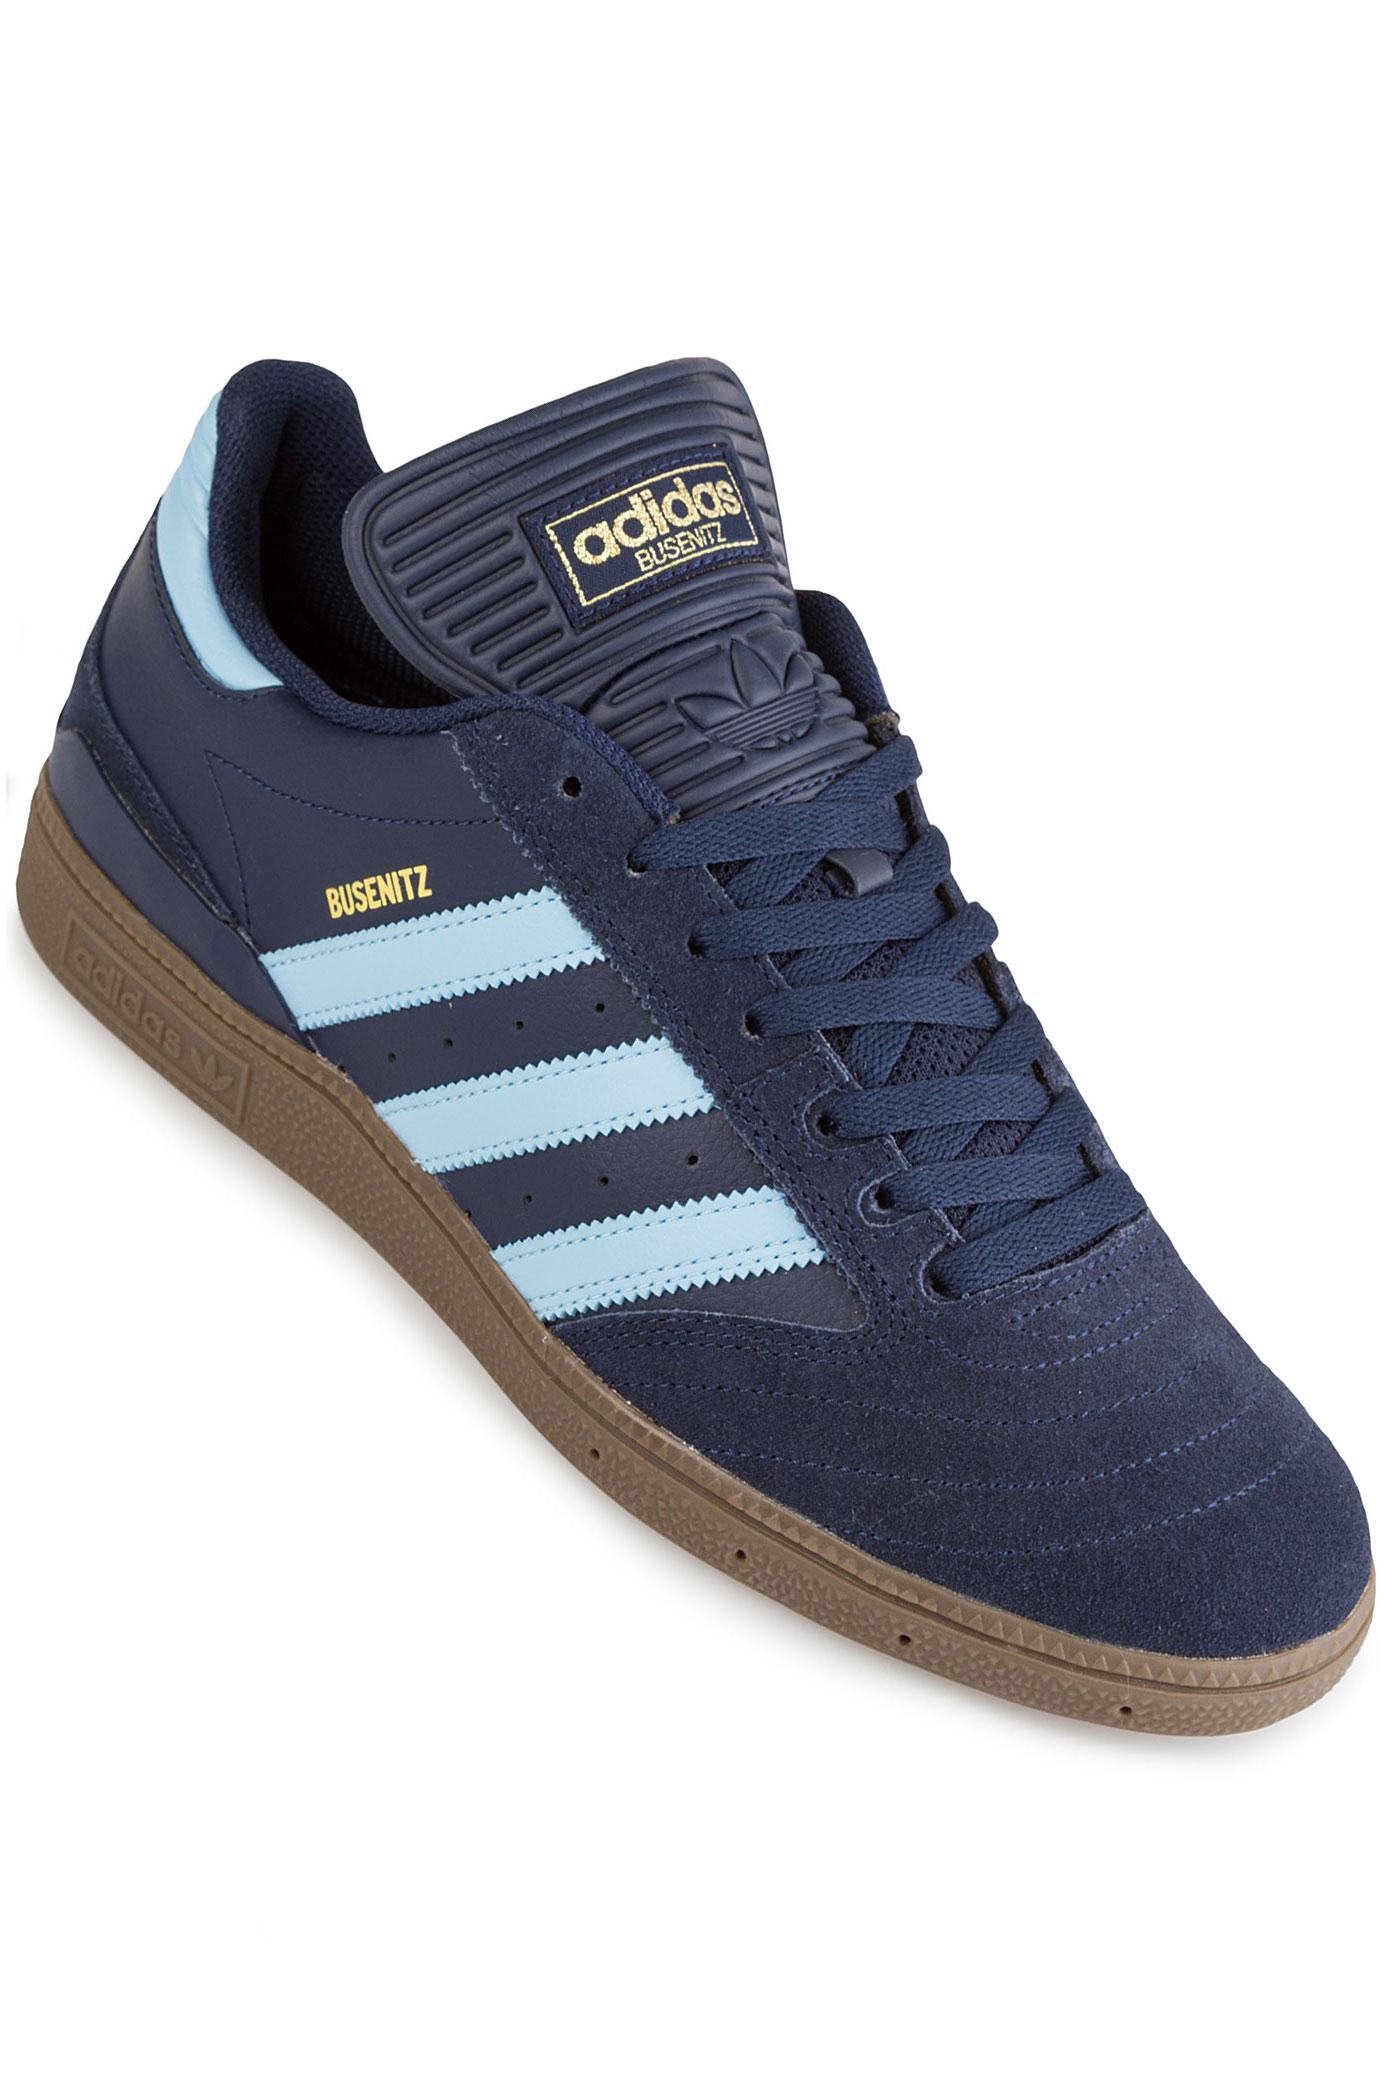 Clear Blue Skateboarding Navy Adidas Gum Chaussurecollegiate Busenitz 4c5AjR3Lq